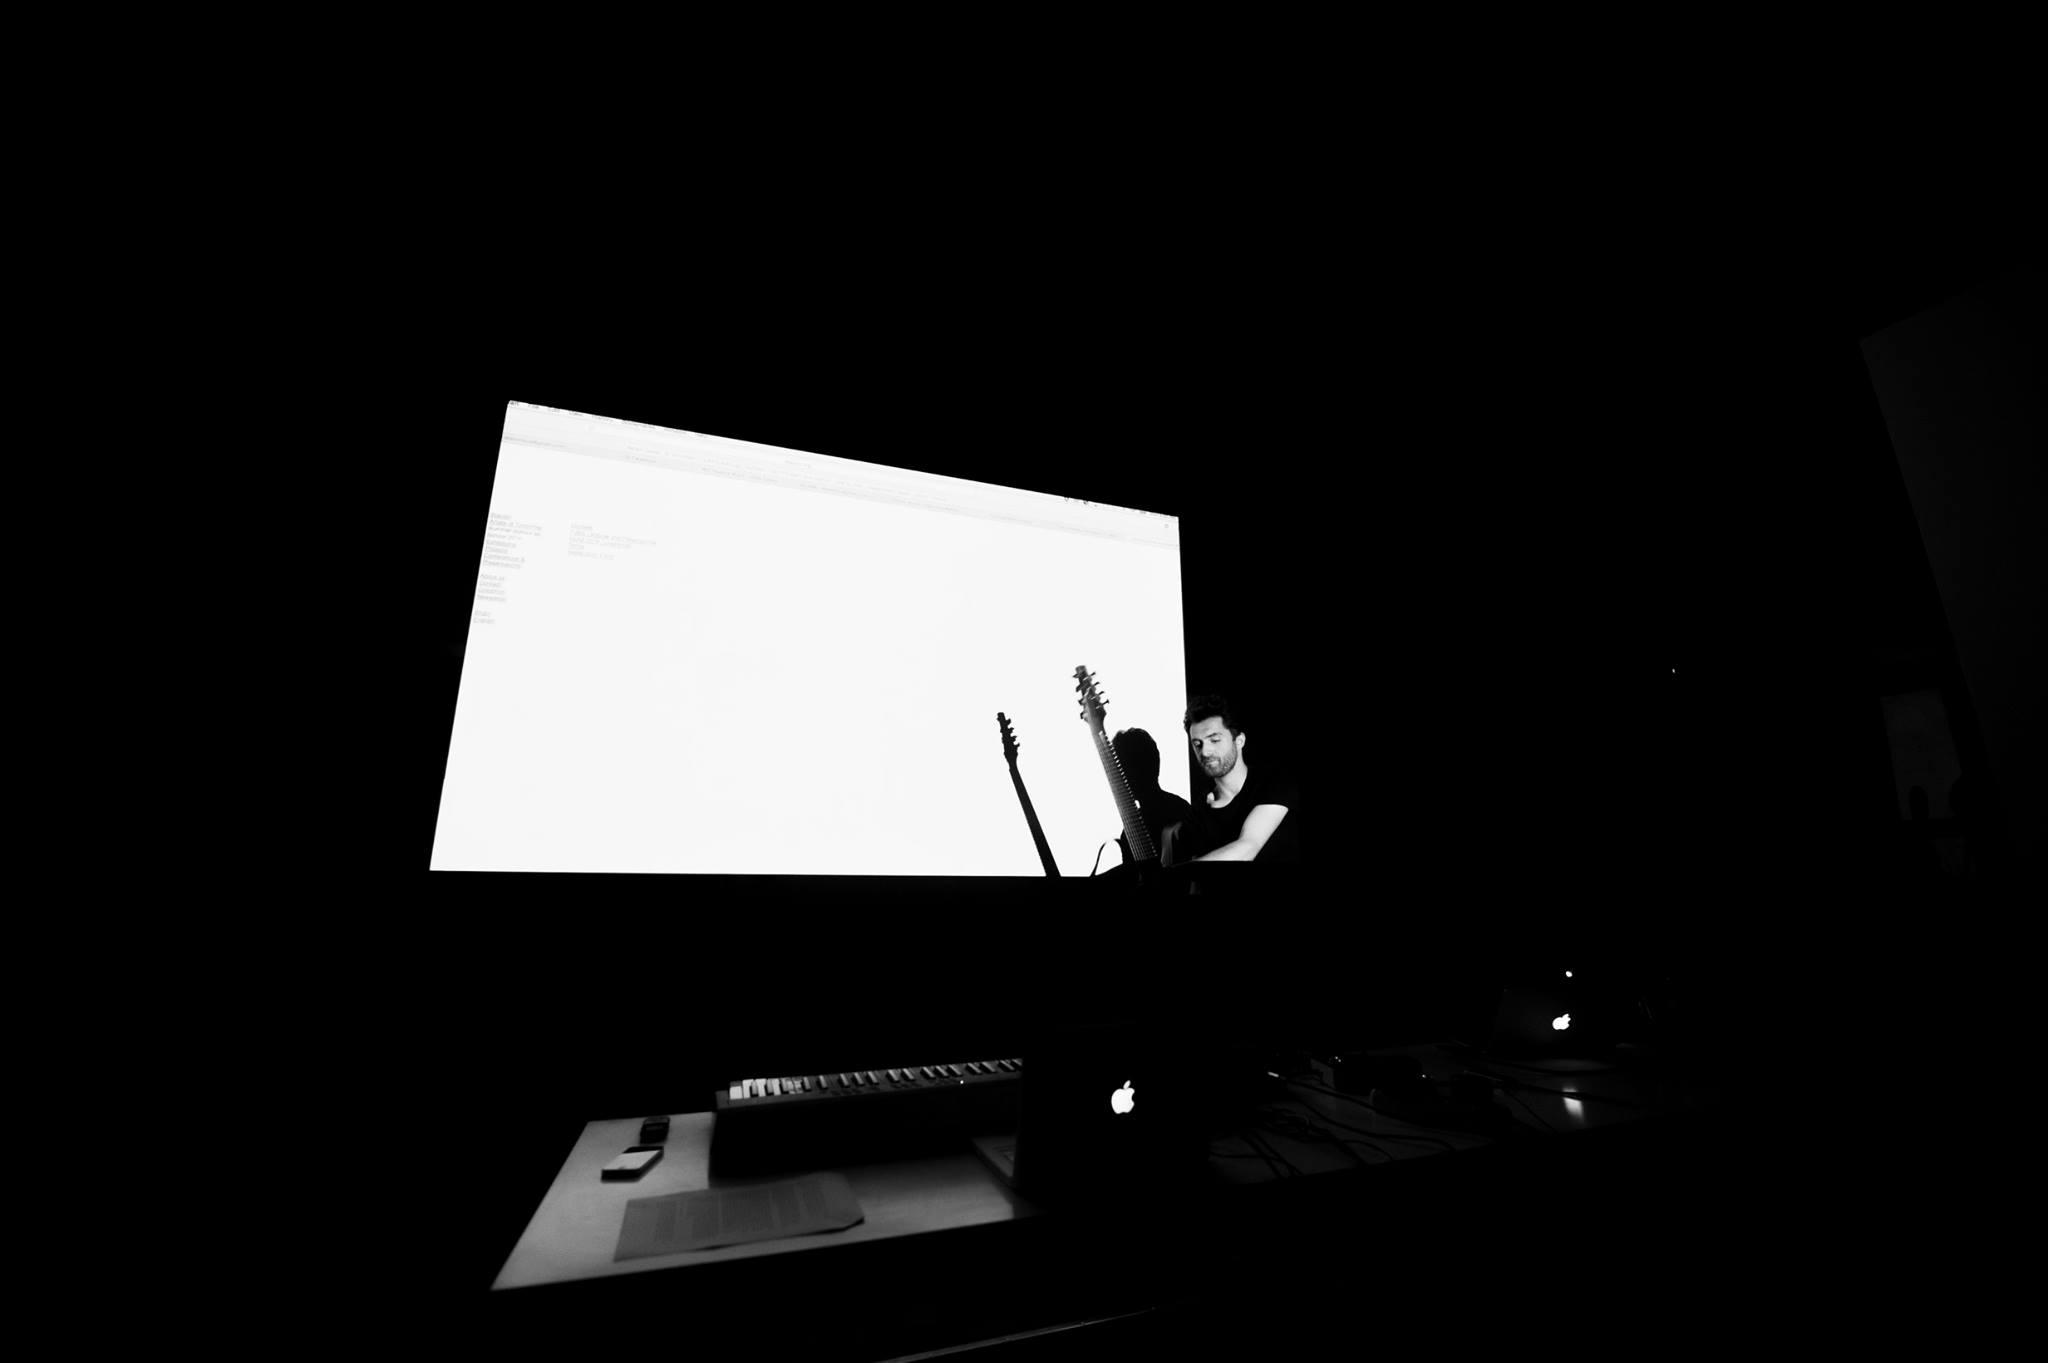 Liburn Jupolli: Composing/Invention